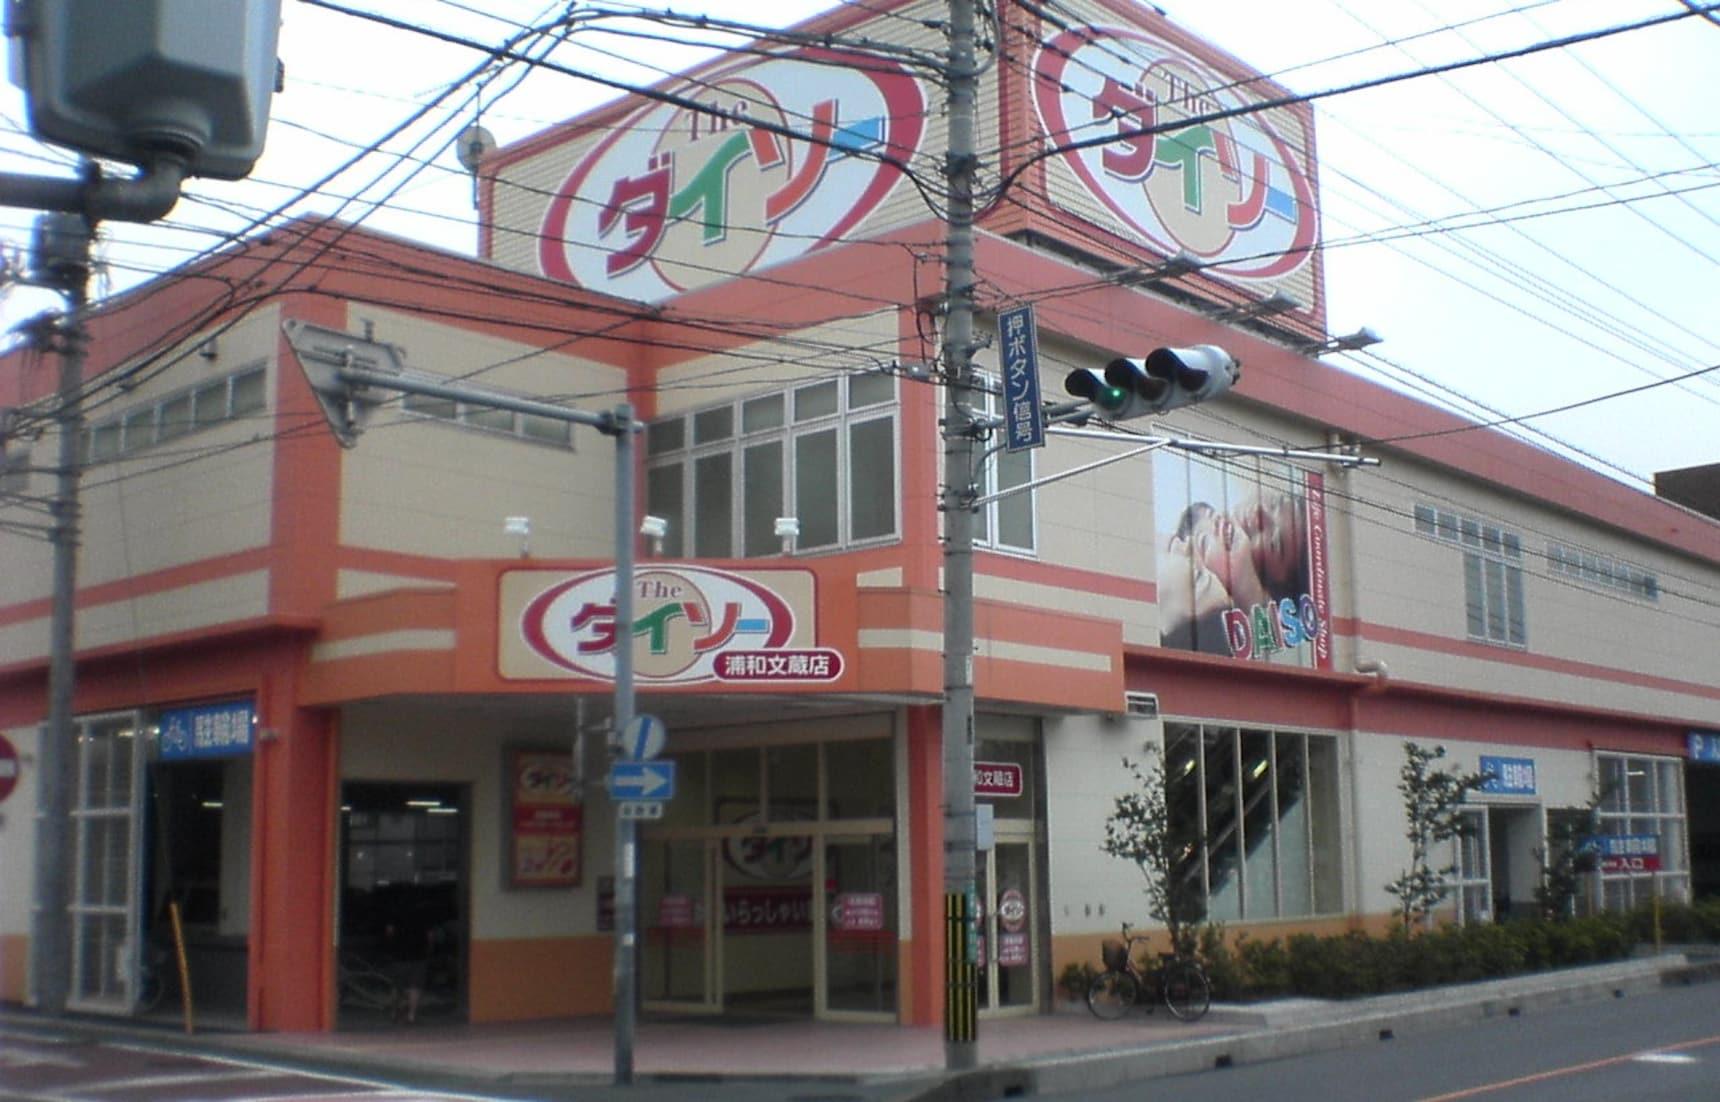 5 Daiso ขนาดใหญ่ใน Tokyo